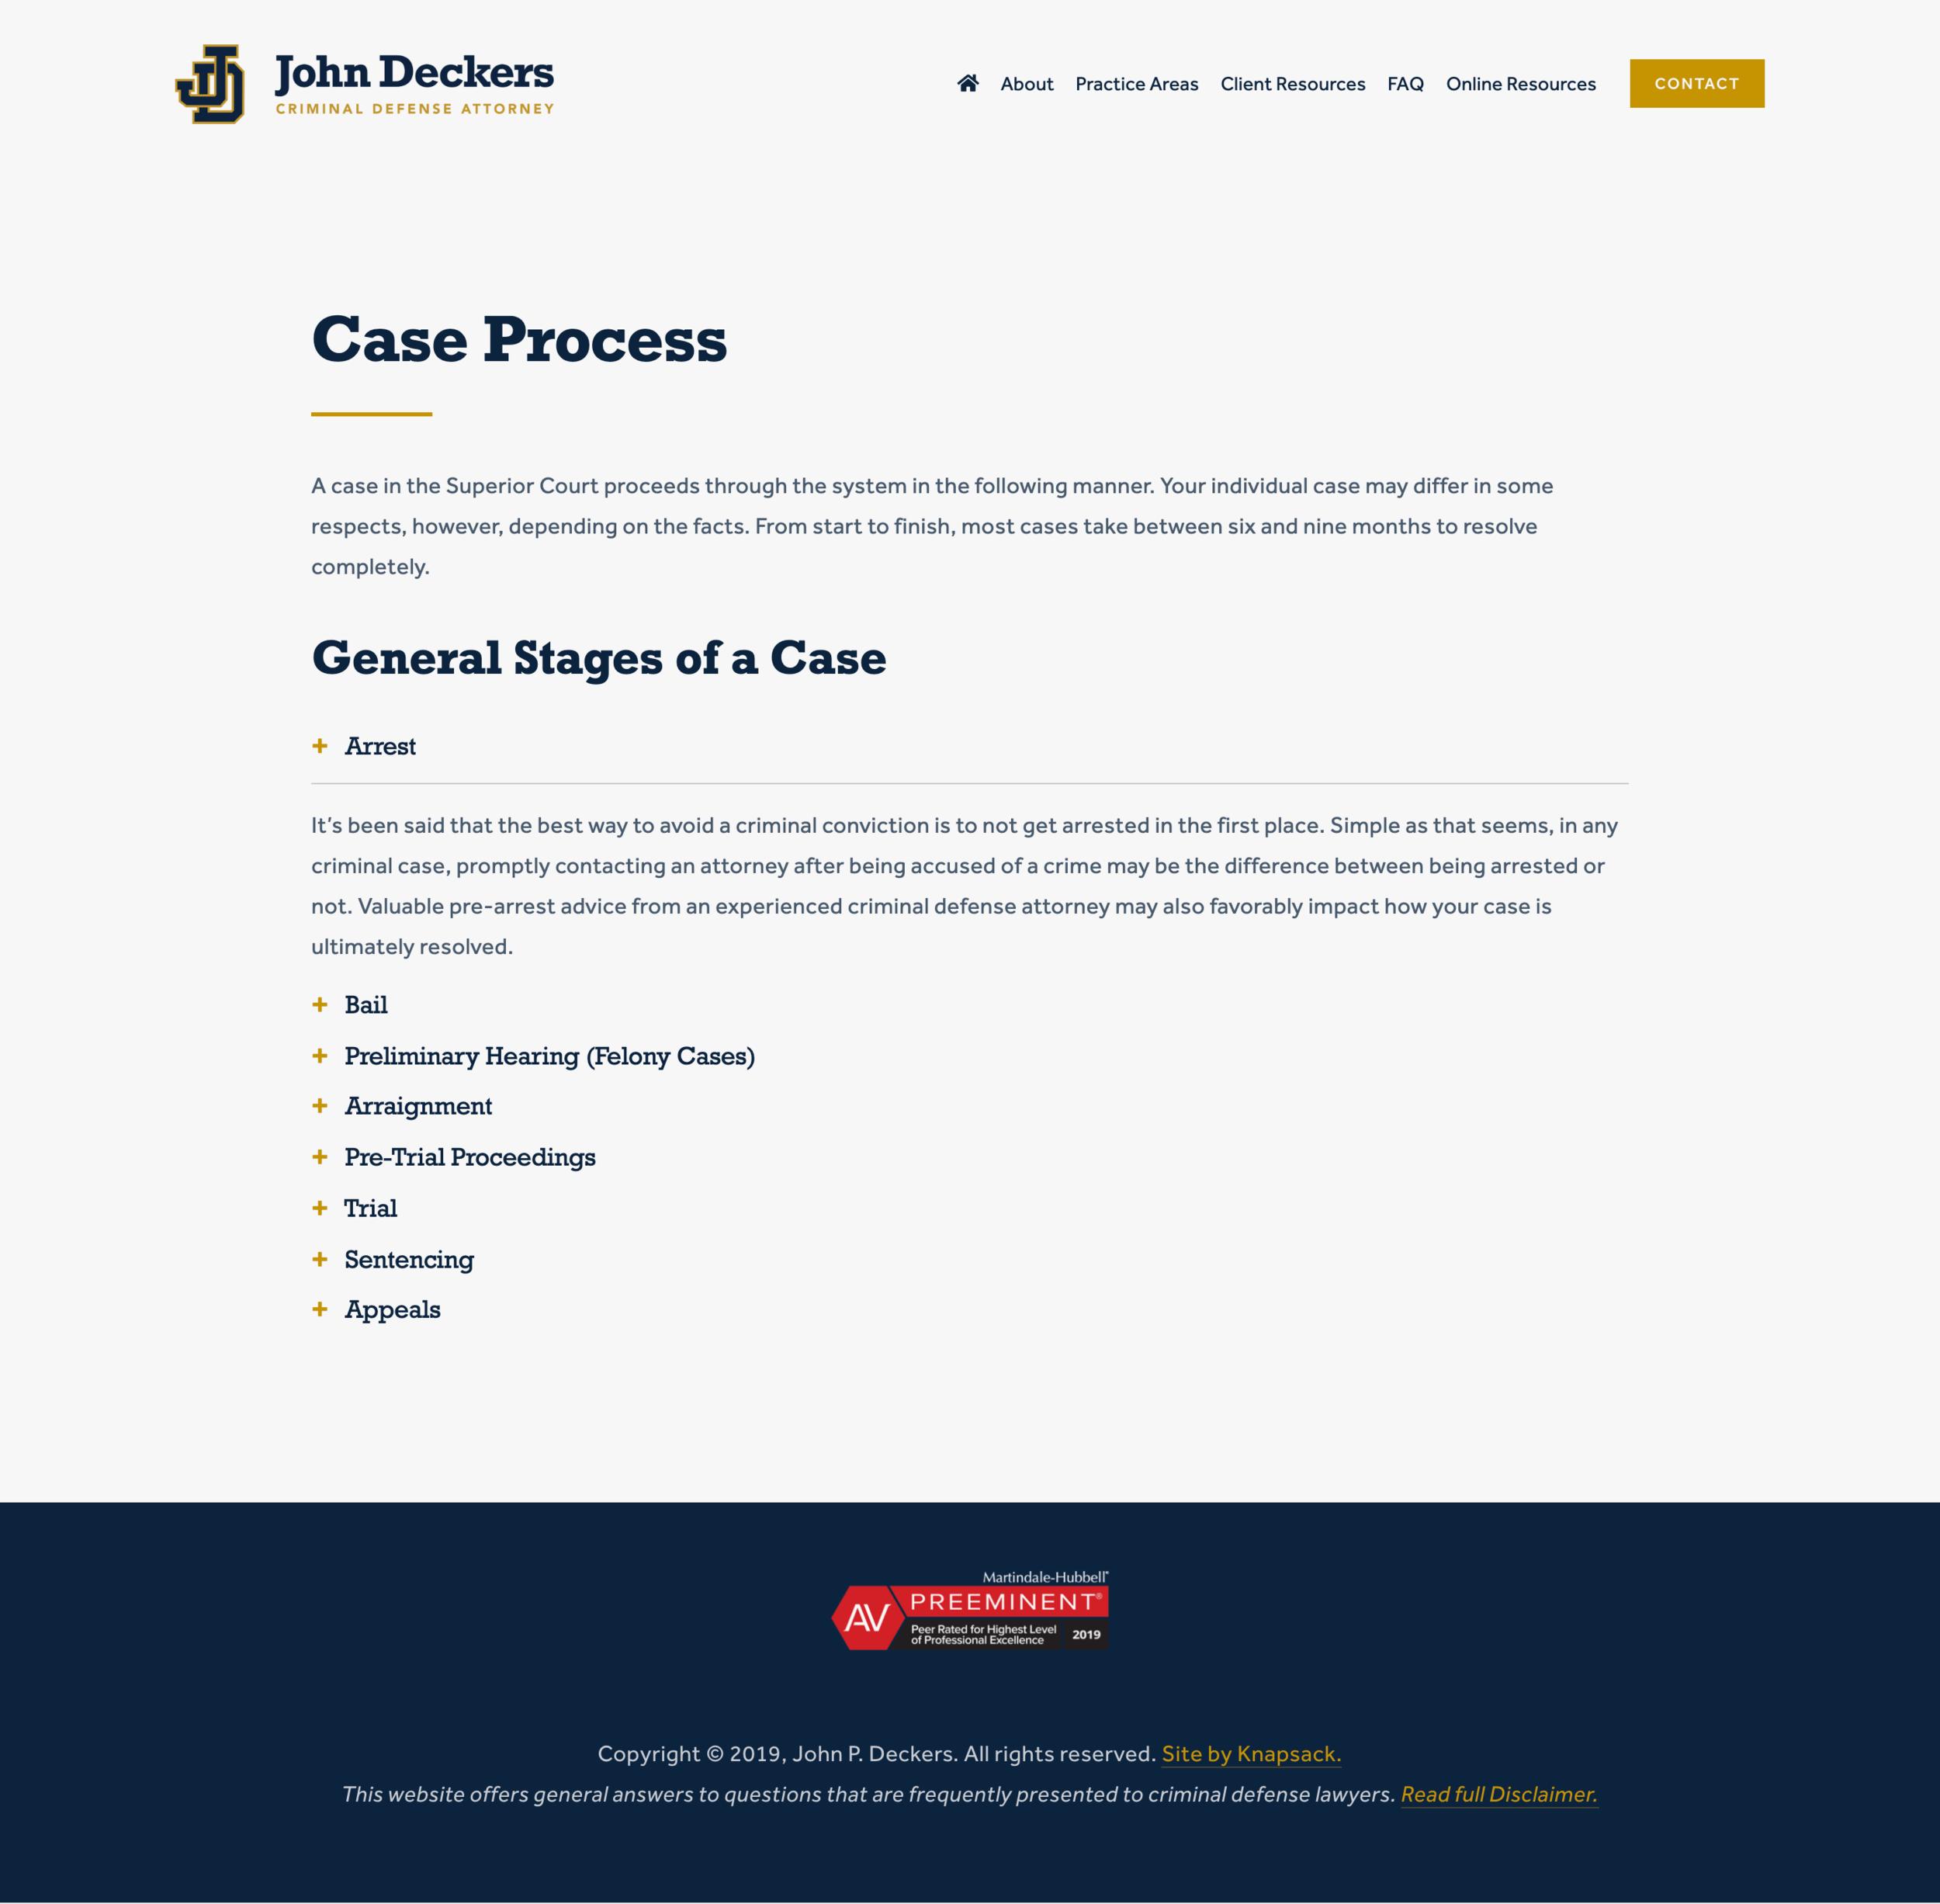 JOhnDeckersLaw_CaseProcess_Mac_Overlay.png